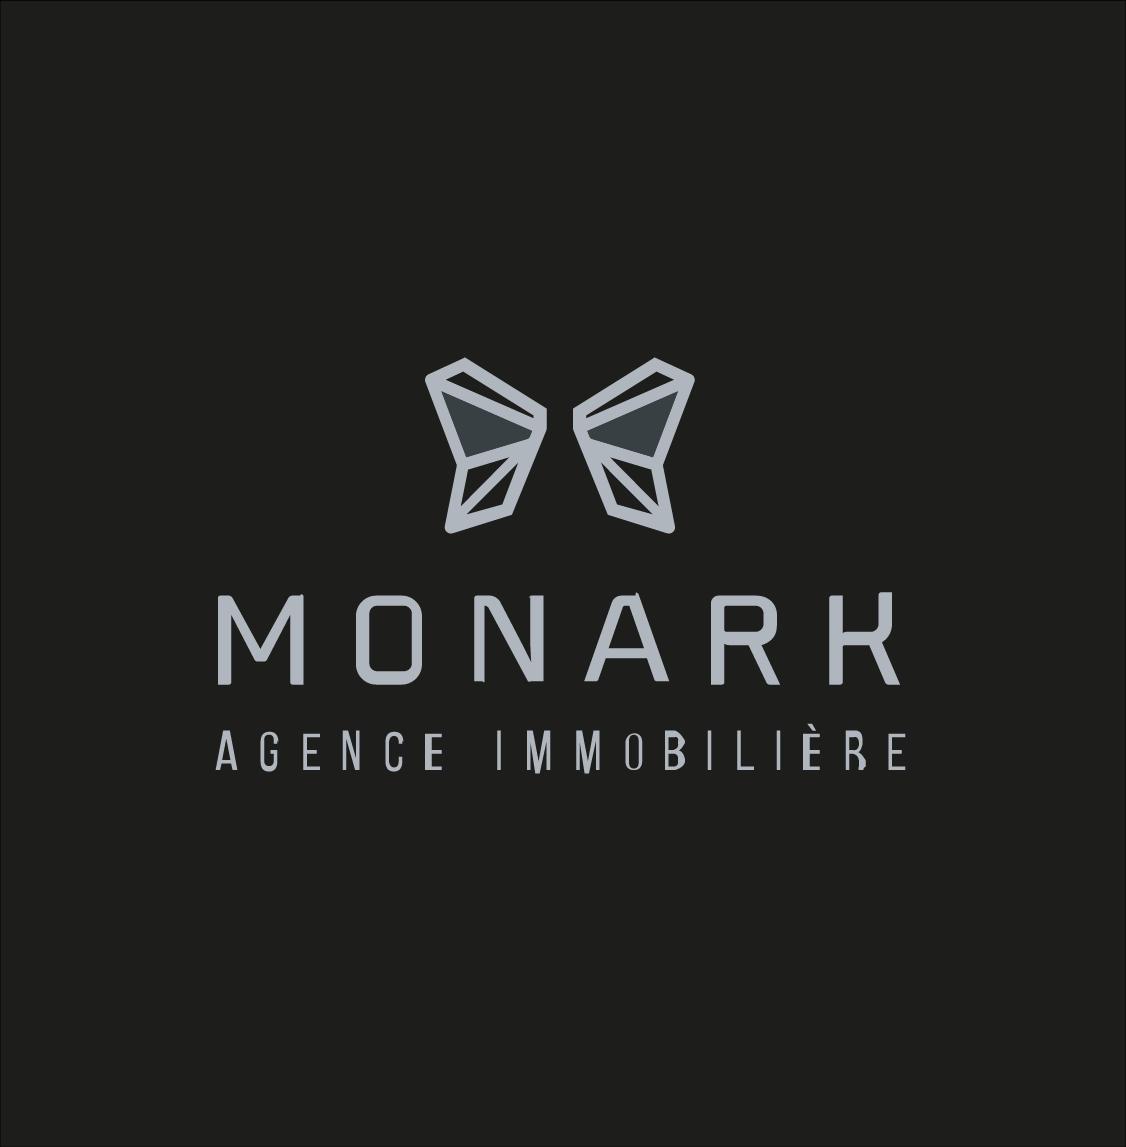 Monark agence immobilière